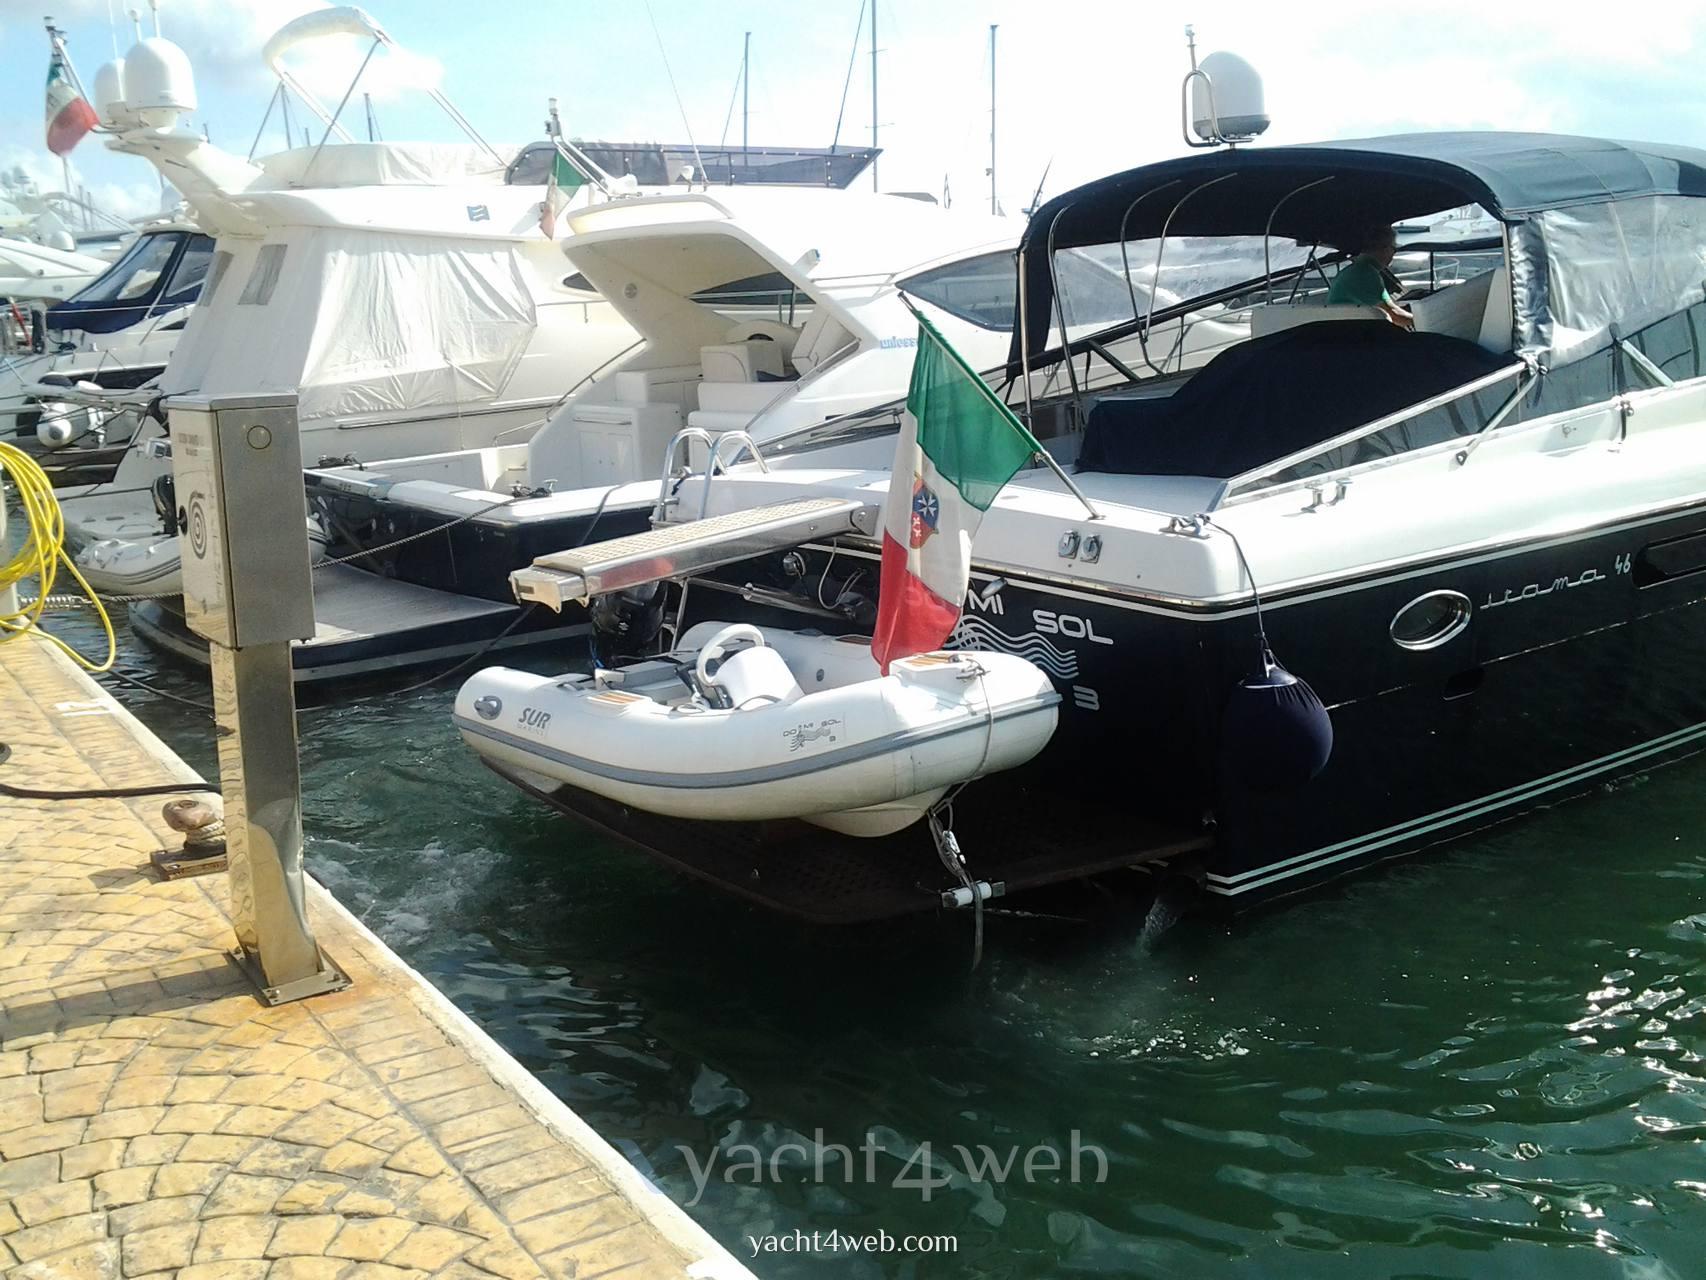 ITAMA 46' Barca a motore usata in vendita